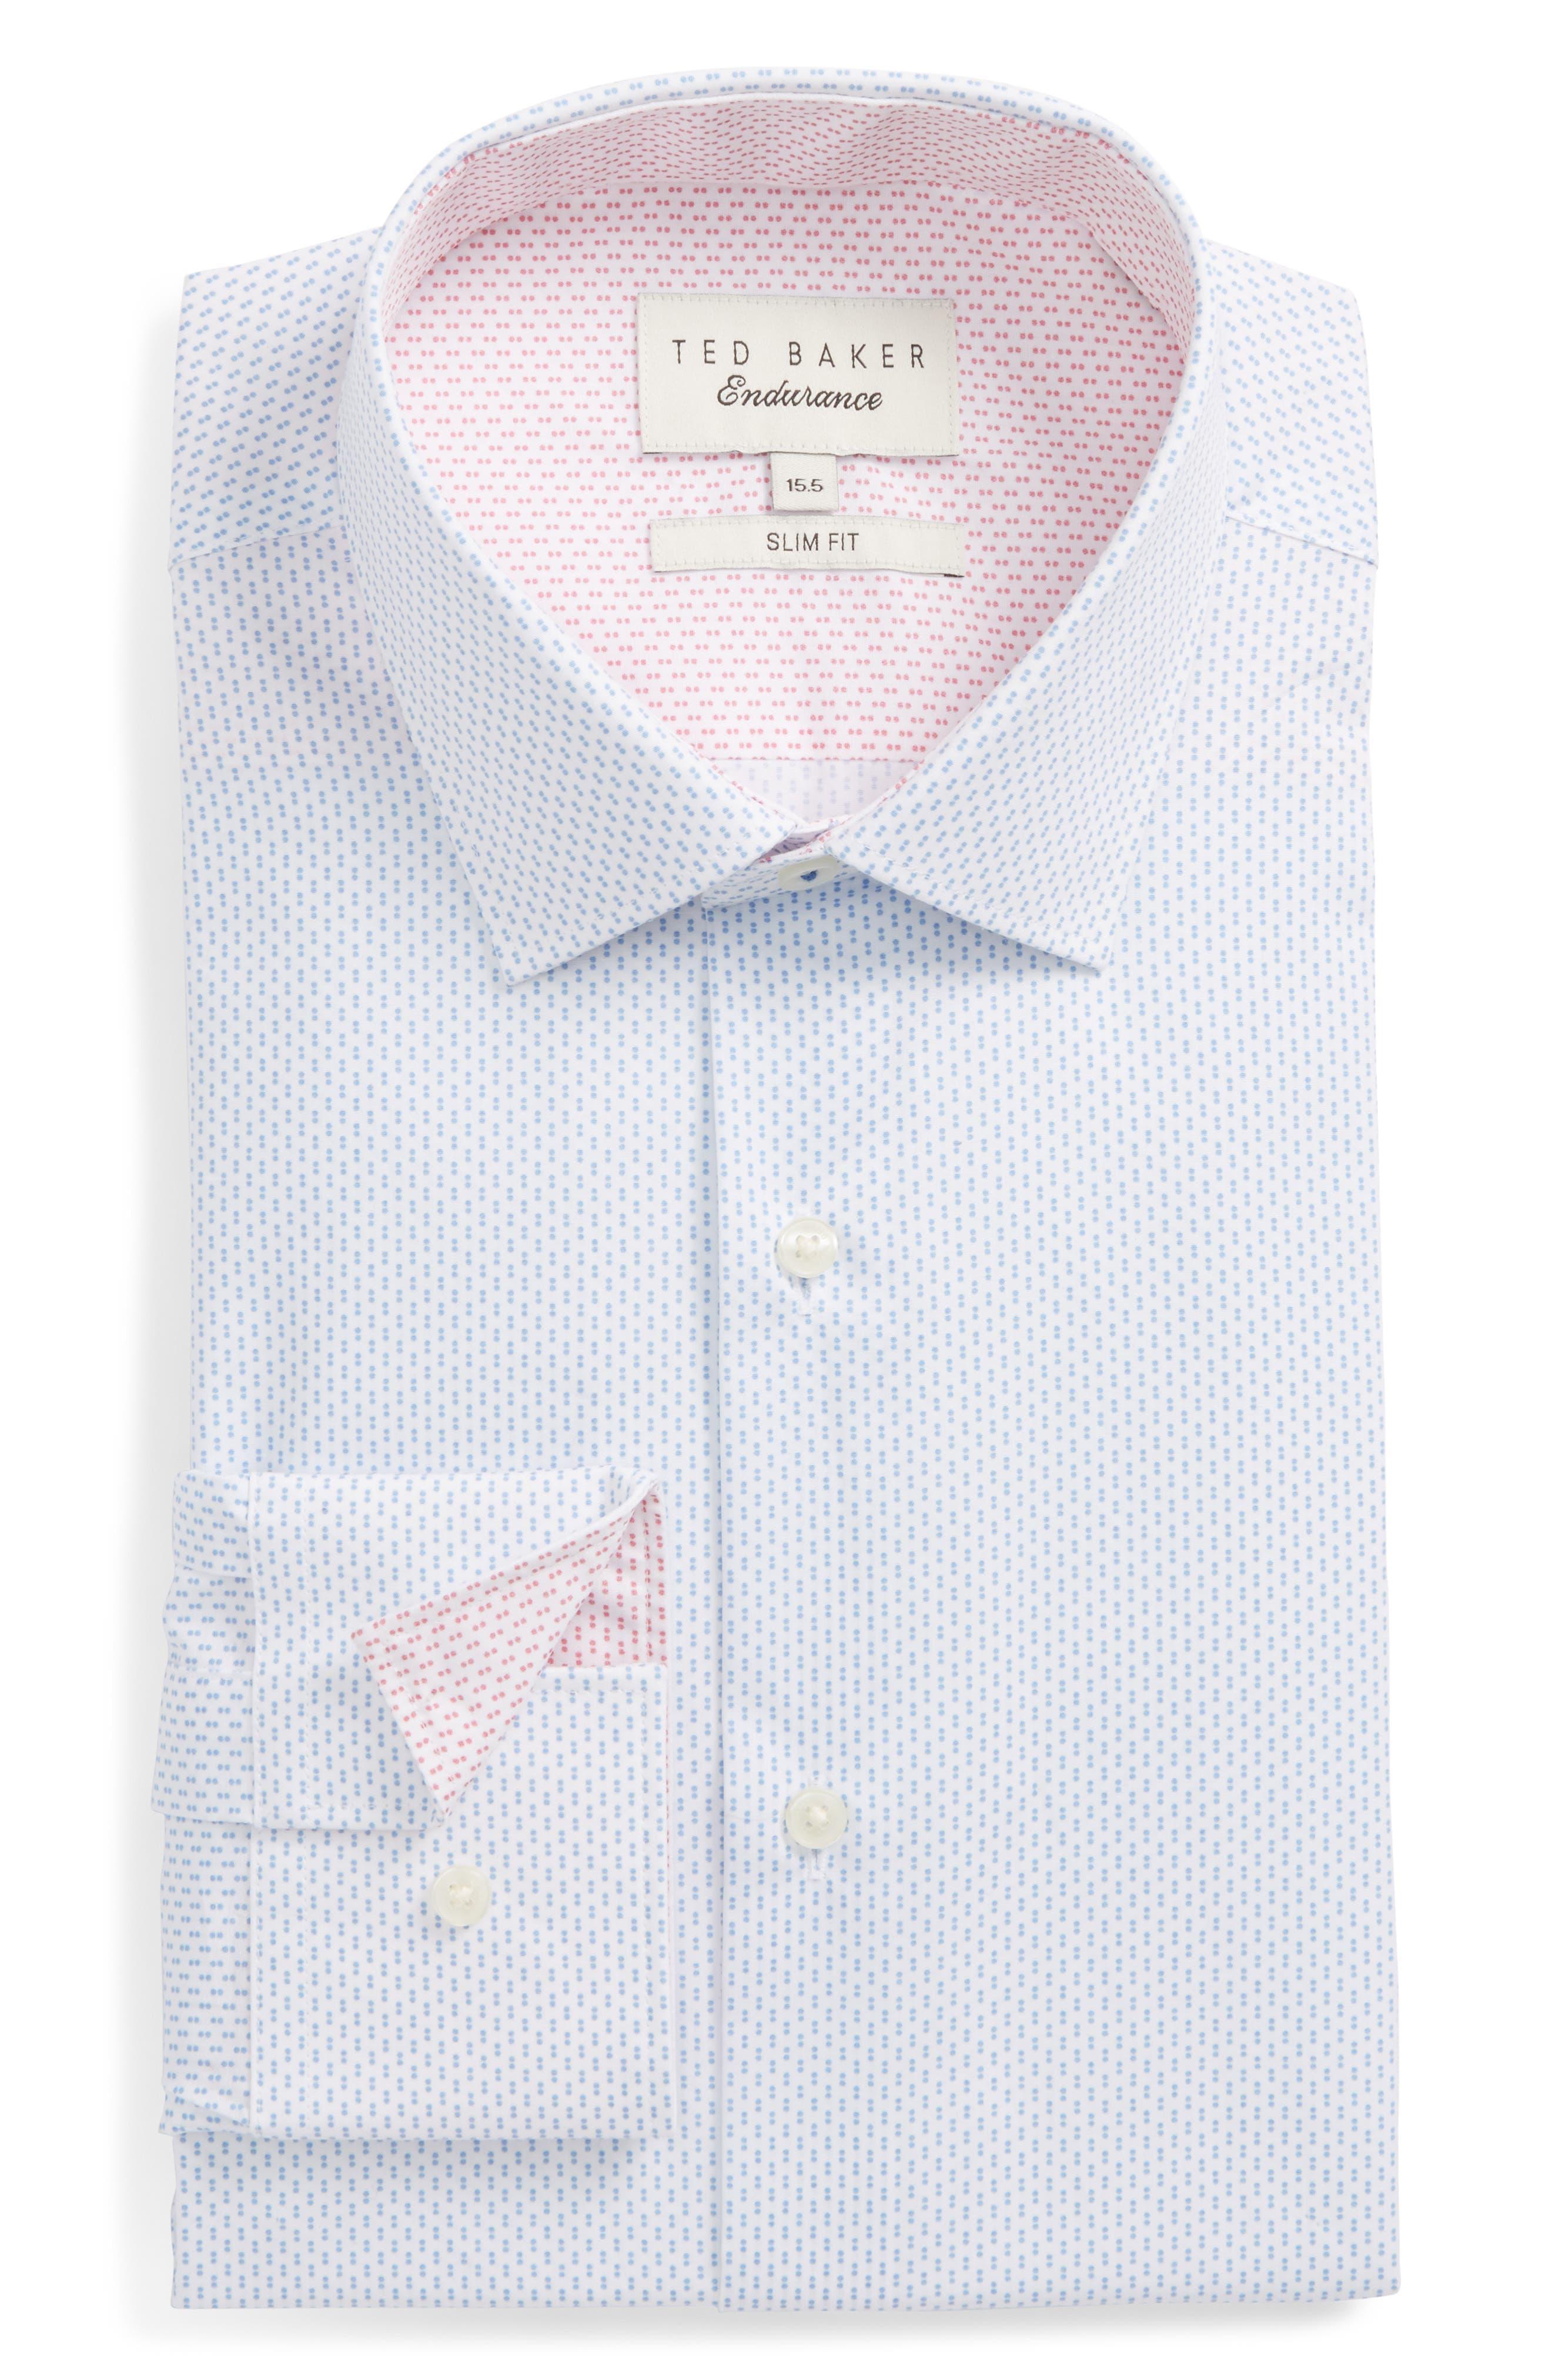 Endurance Barged Slim Fit Double Dot Dress Shirt,                         Main,                         color,